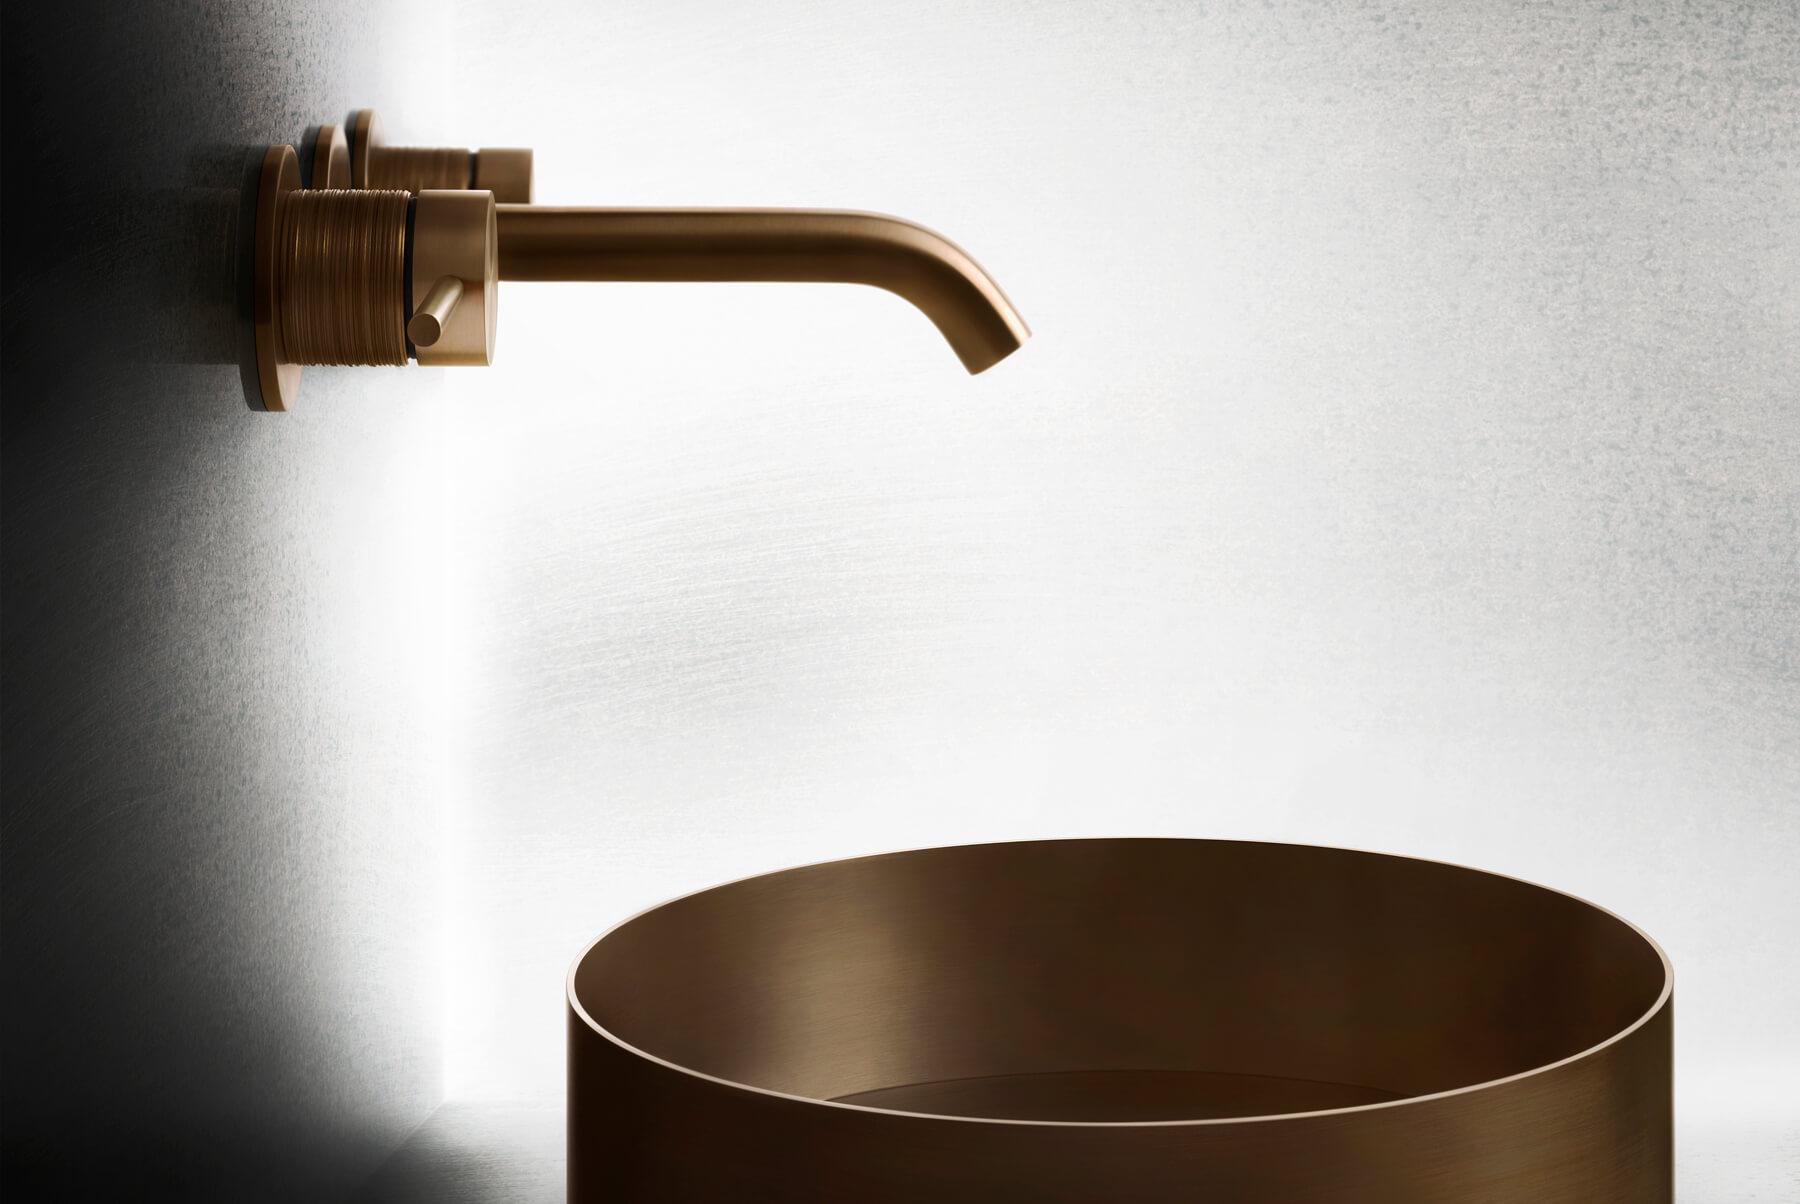 Brassware-GESSI-316-Inset-5-1800x1204